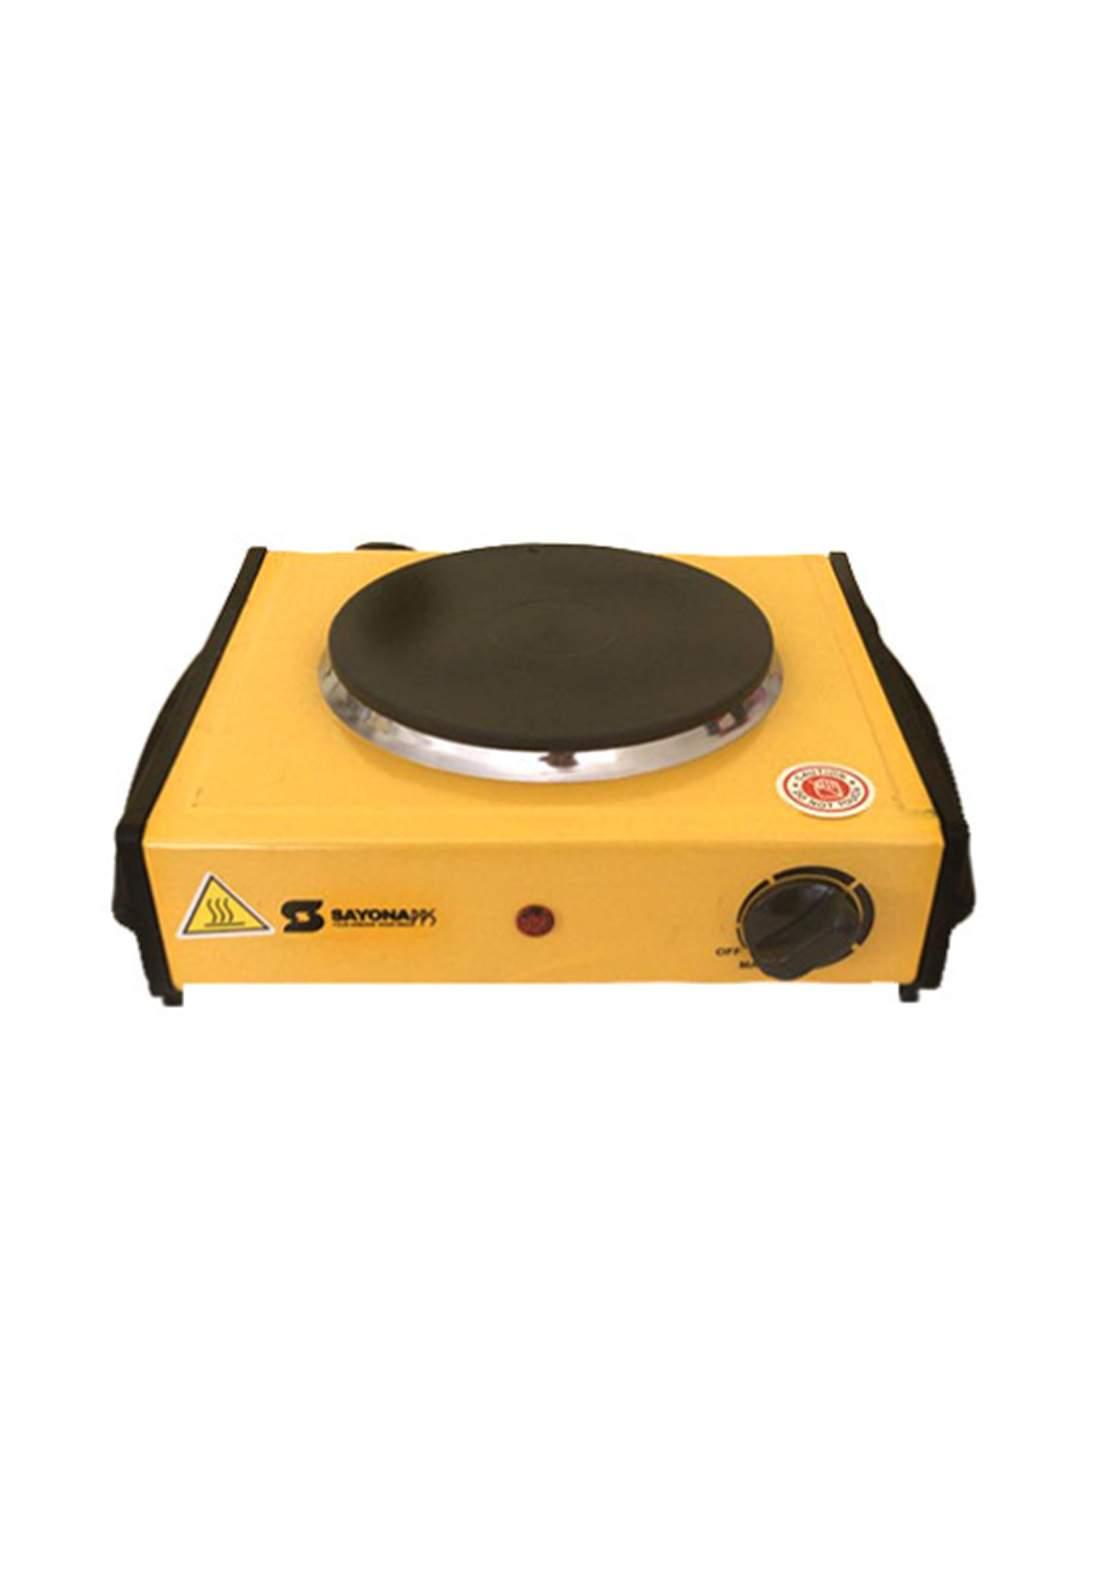 Sayona 4126 Cooking Coil 1000 Watt هيتر كهربائي